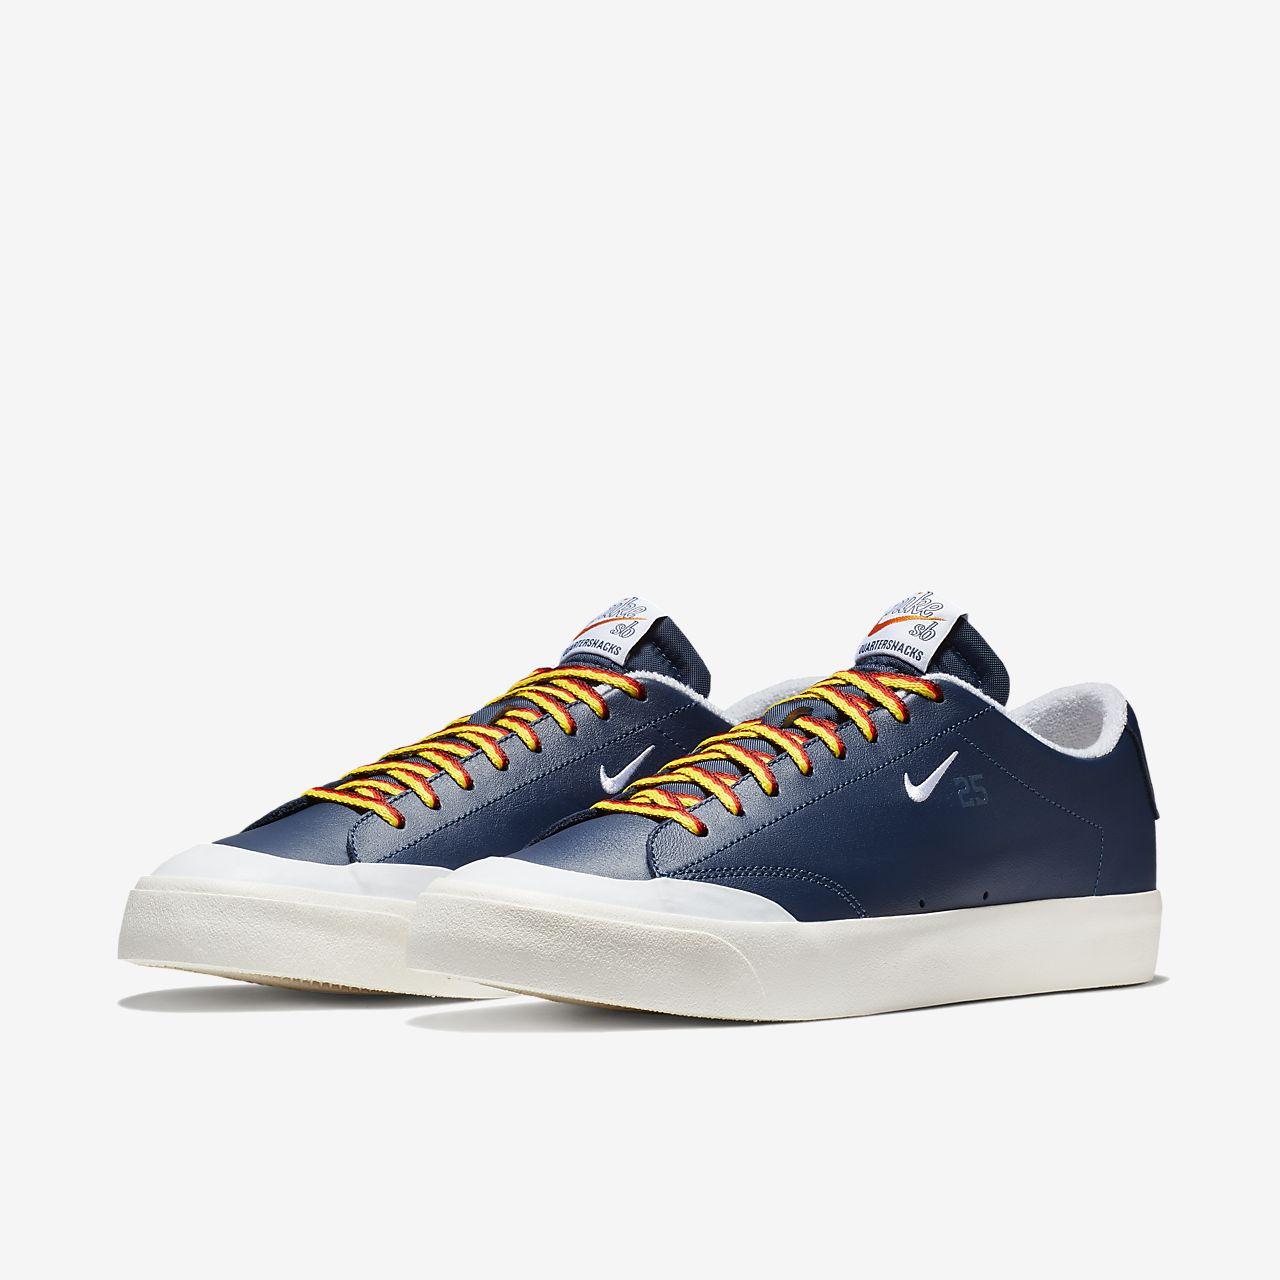 25d012200739 Nike SB Zoom Blazer Low XT QS Men s Skateboarding Shoe. Nike.com GB